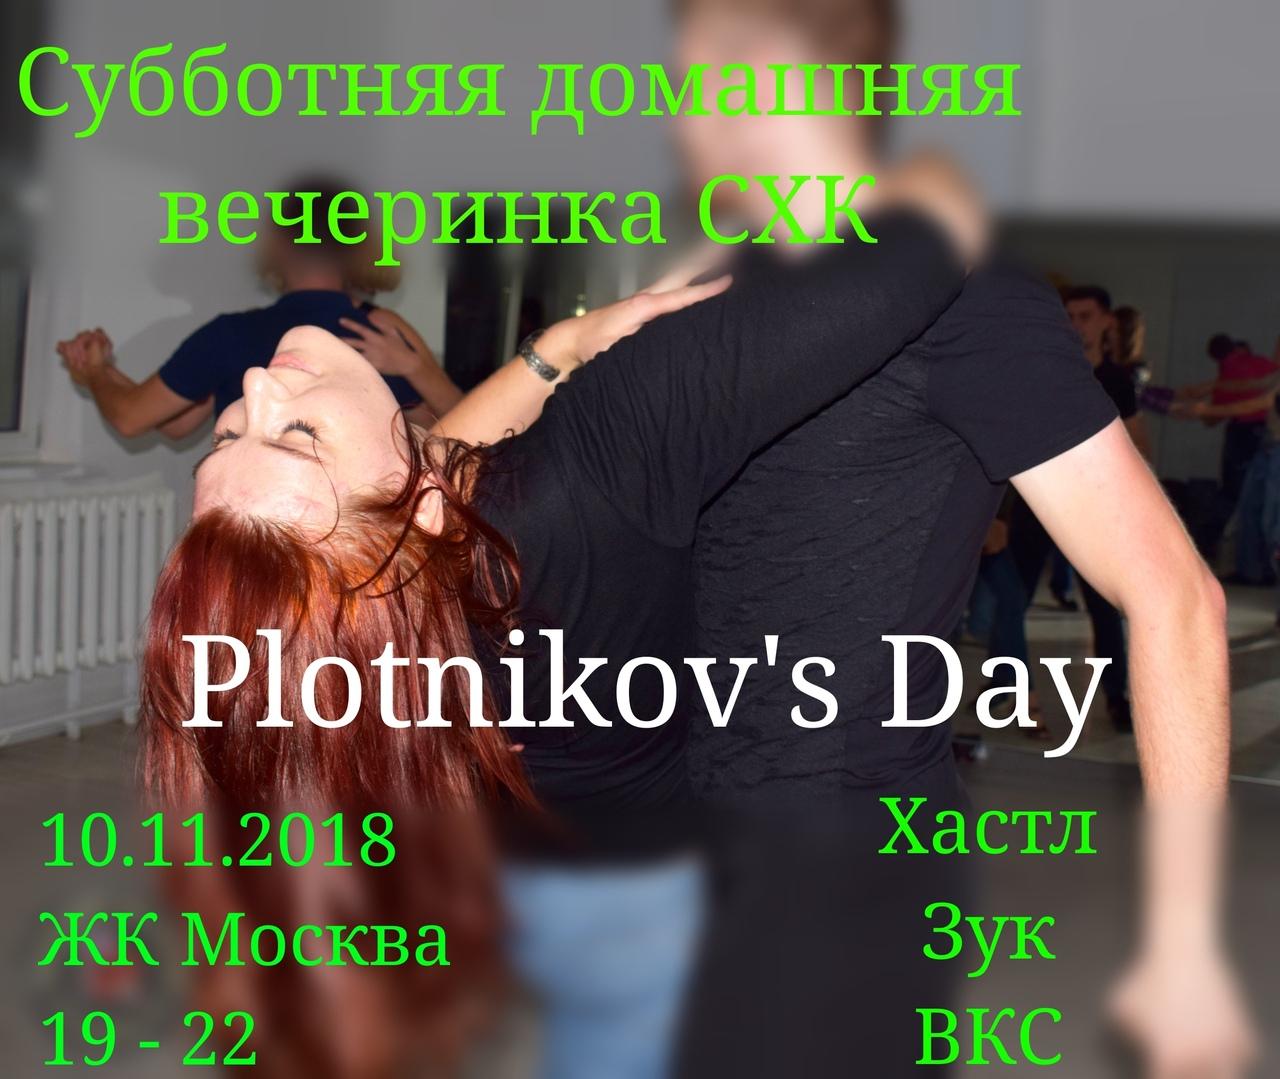 Афиша Самара Plotnikov'S Day - субботняя вечеринка СХК 10.11